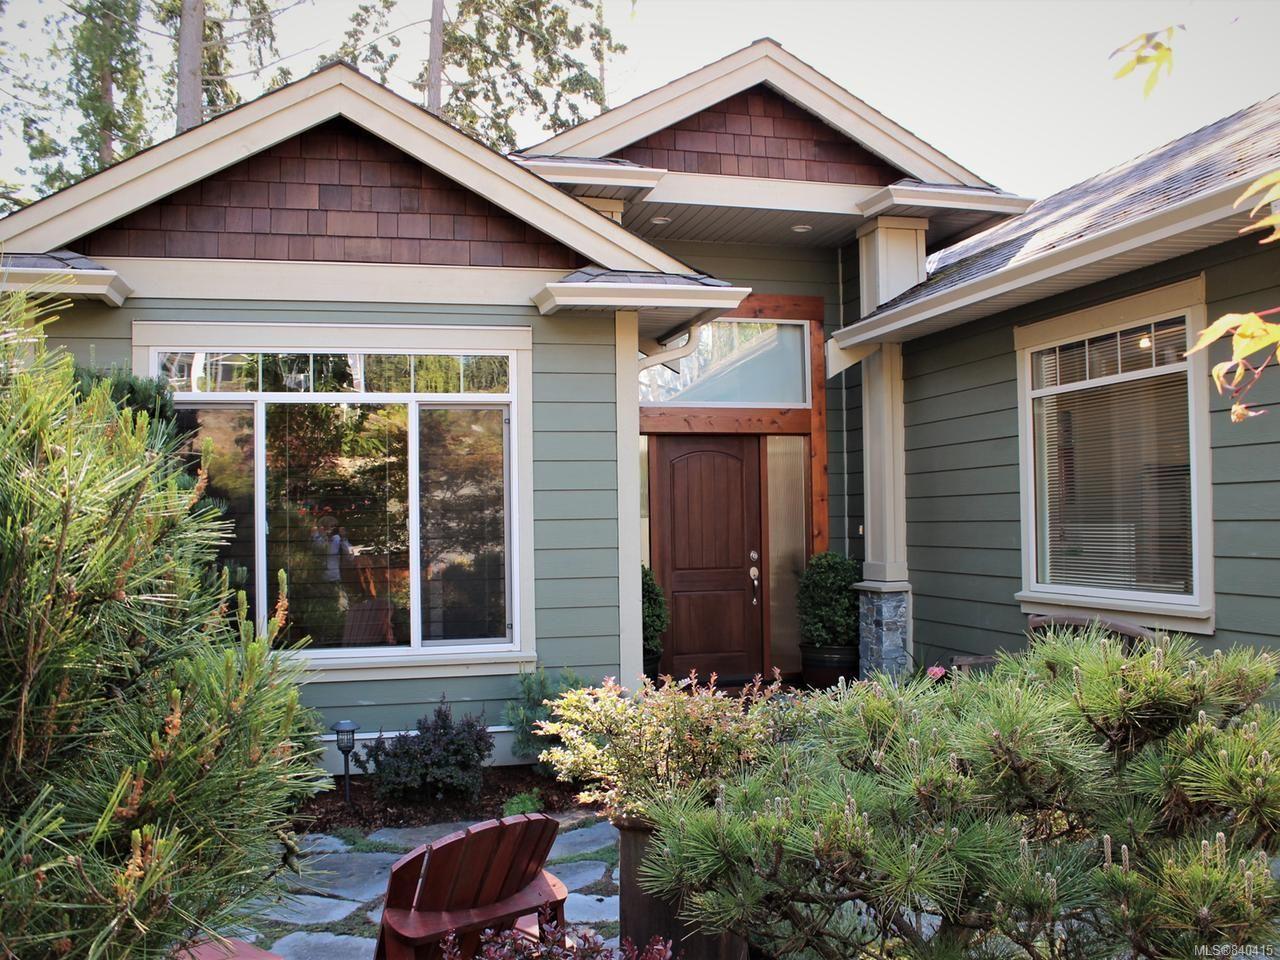 Main Photo: 348 Manhas Pl in NANAIMO: Na Departure Bay House for sale (Nanaimo)  : MLS®# 840415